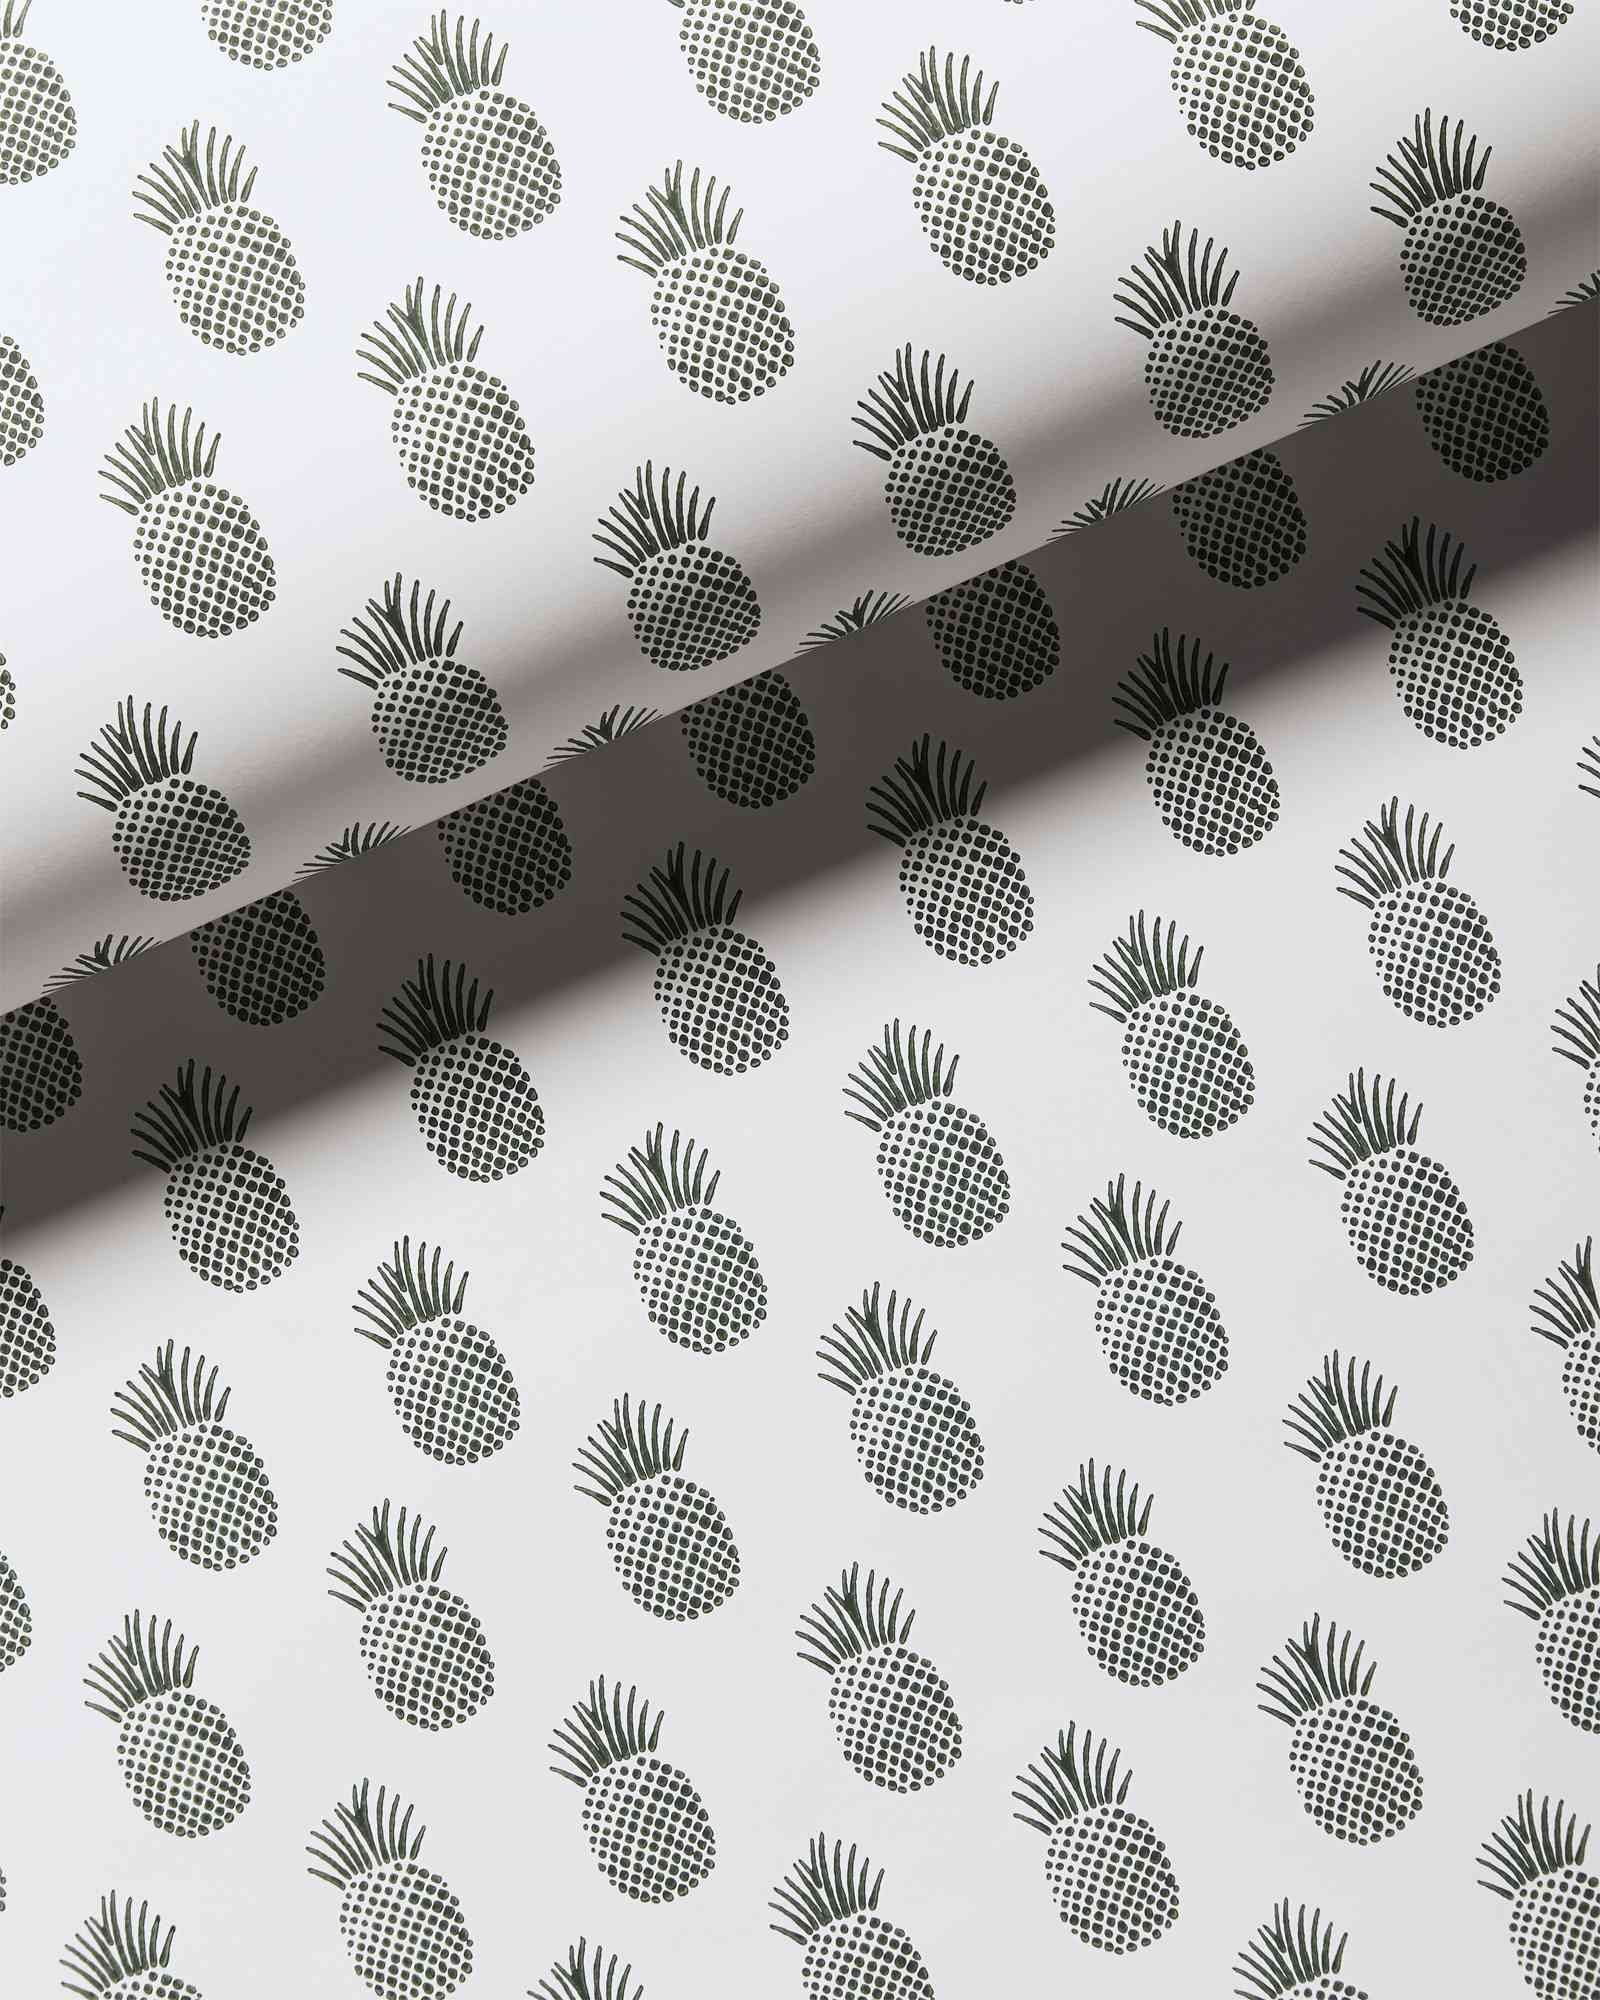 Black-and-white pineapple wallpaper